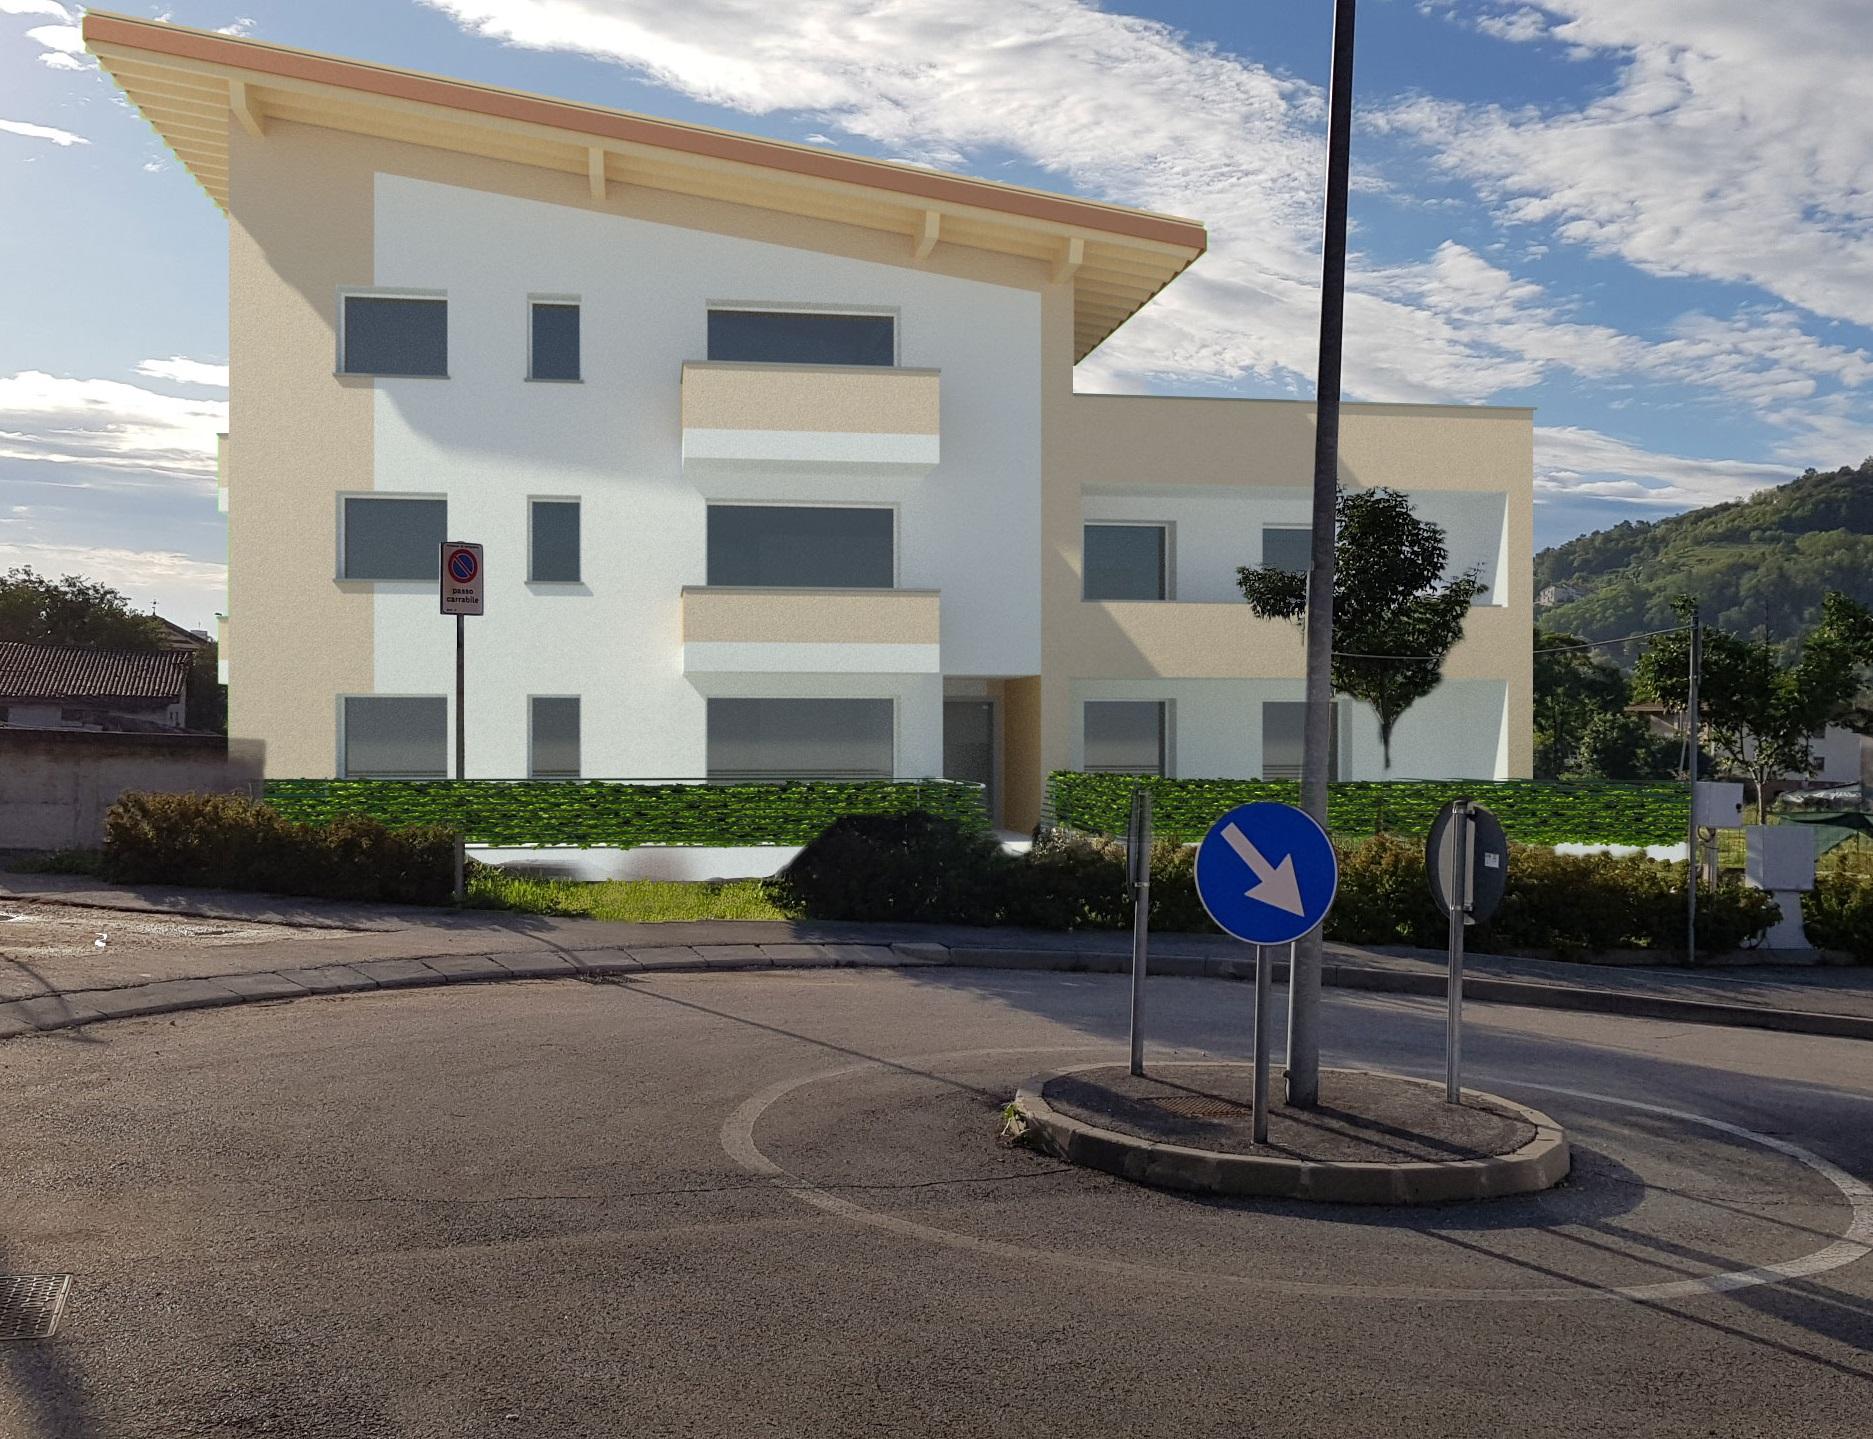 MA JOLIE - Appartamenti in Classe A ad Arzignano (PROSSIMAMENTE)